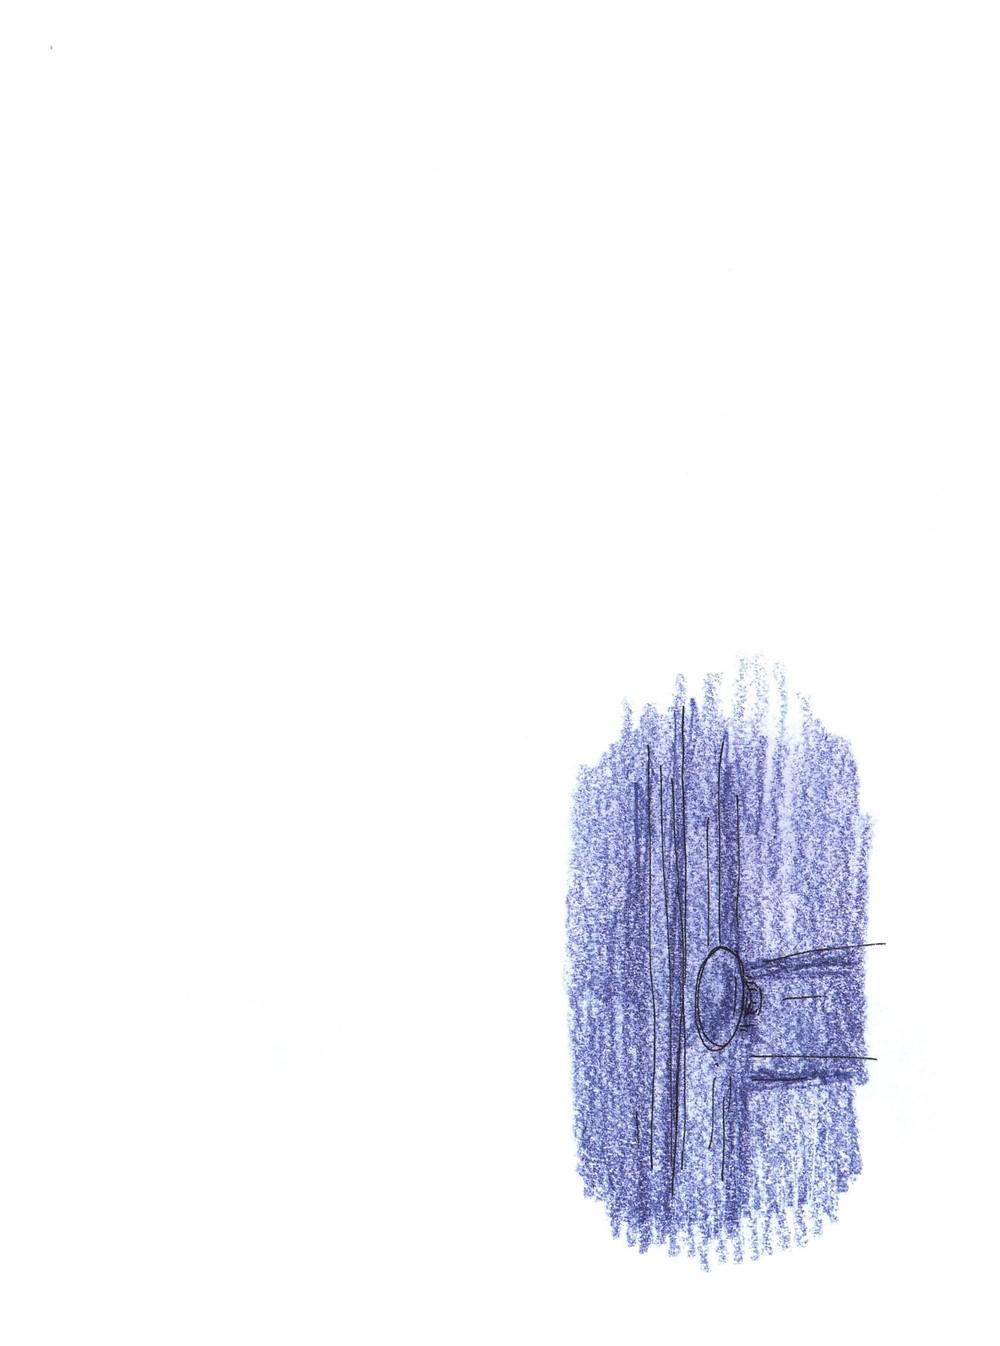 "Романтический комикс об отношениях. ""Бойня"", Бастиен Вивес. Страница 70"